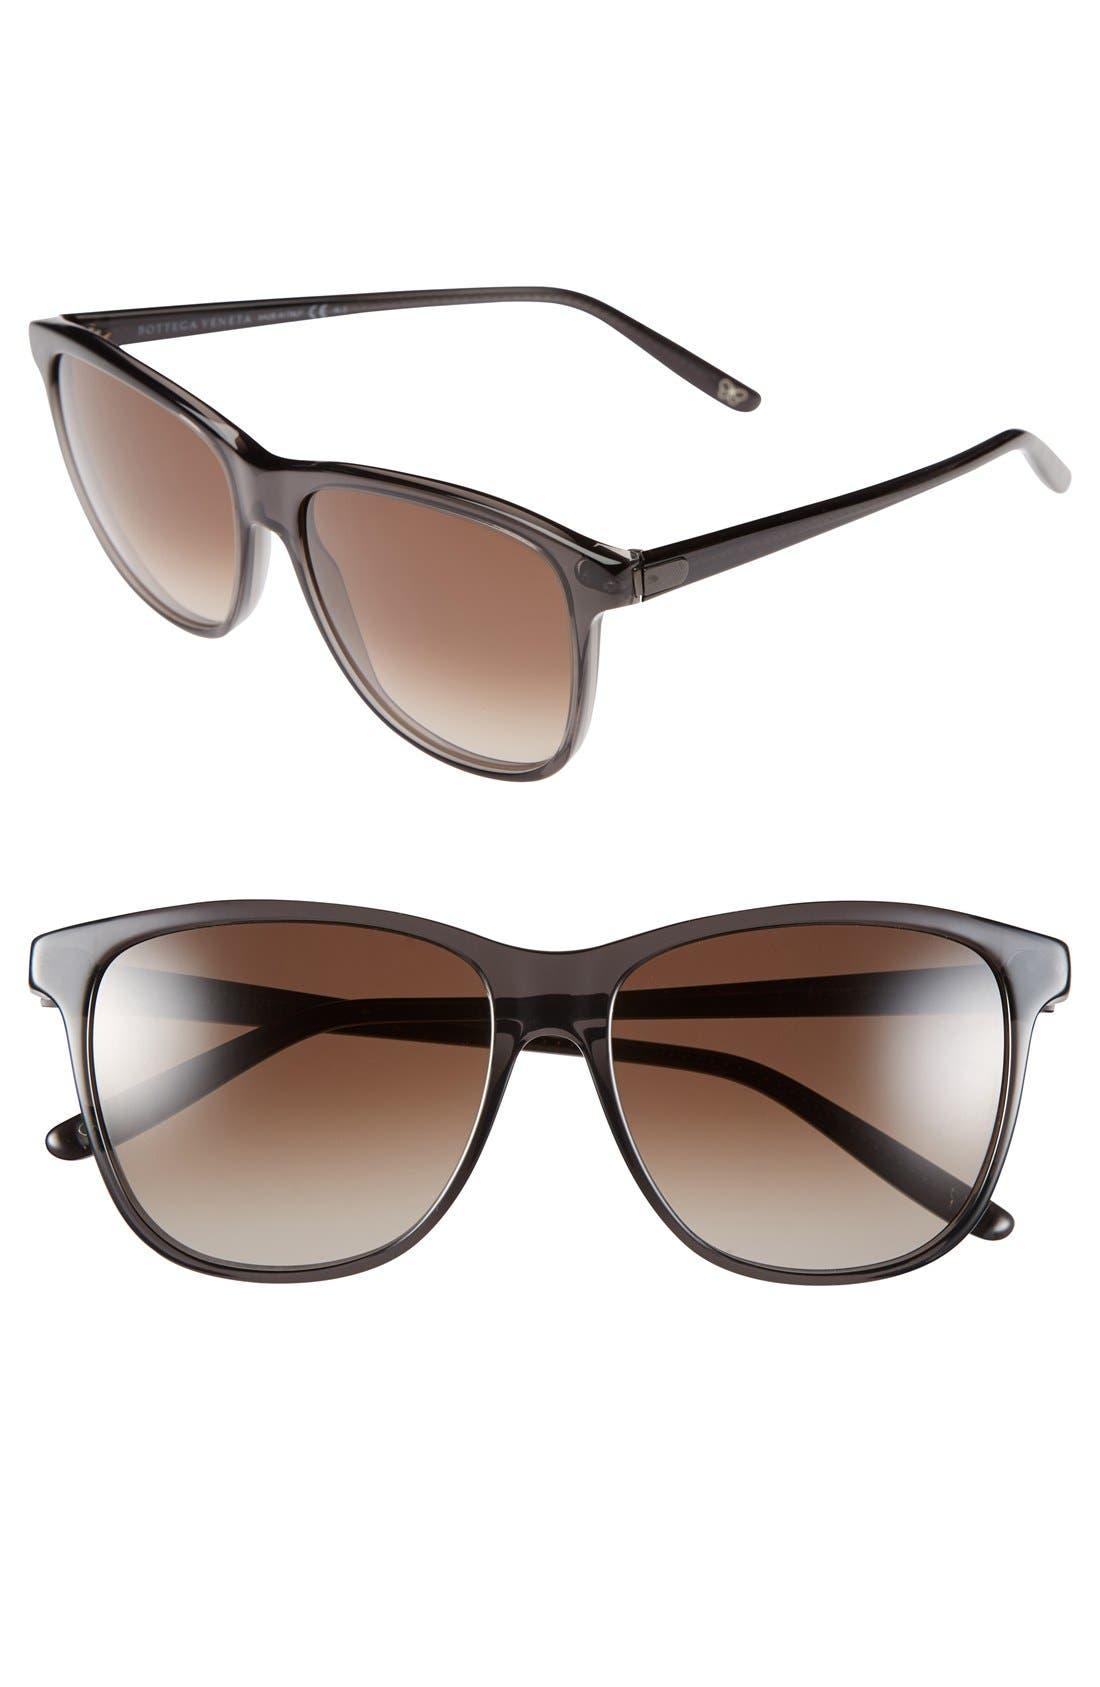 Alternate Image 1 Selected - Bottega Veneta 56mm Sunglasses